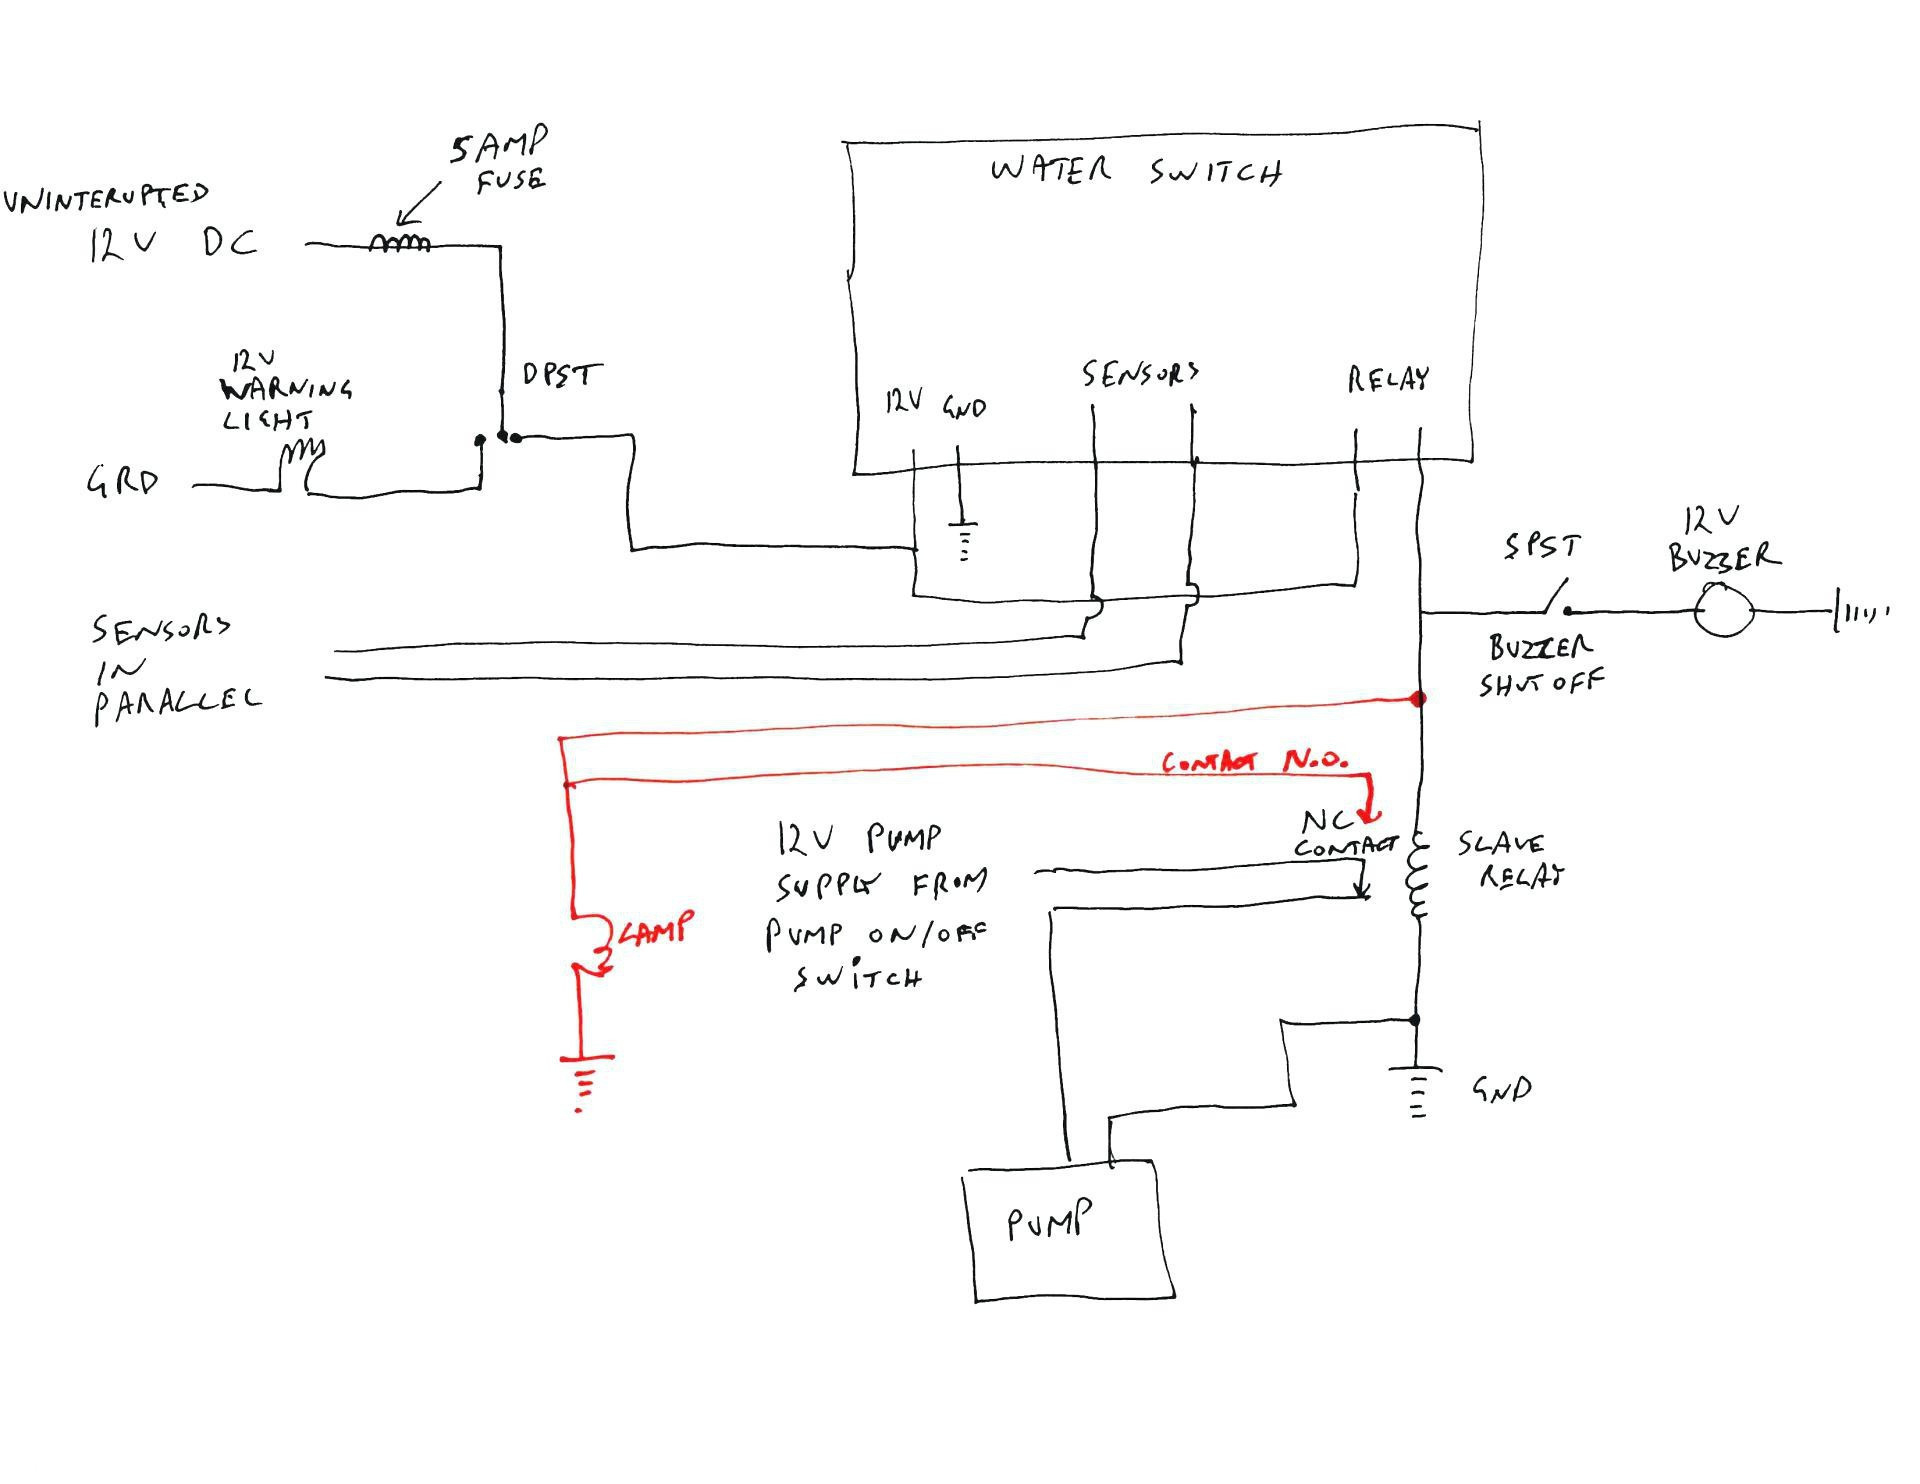 Electric Furnace Sequencer - Facias - Coleman Electric Furnace Wiring Diagram